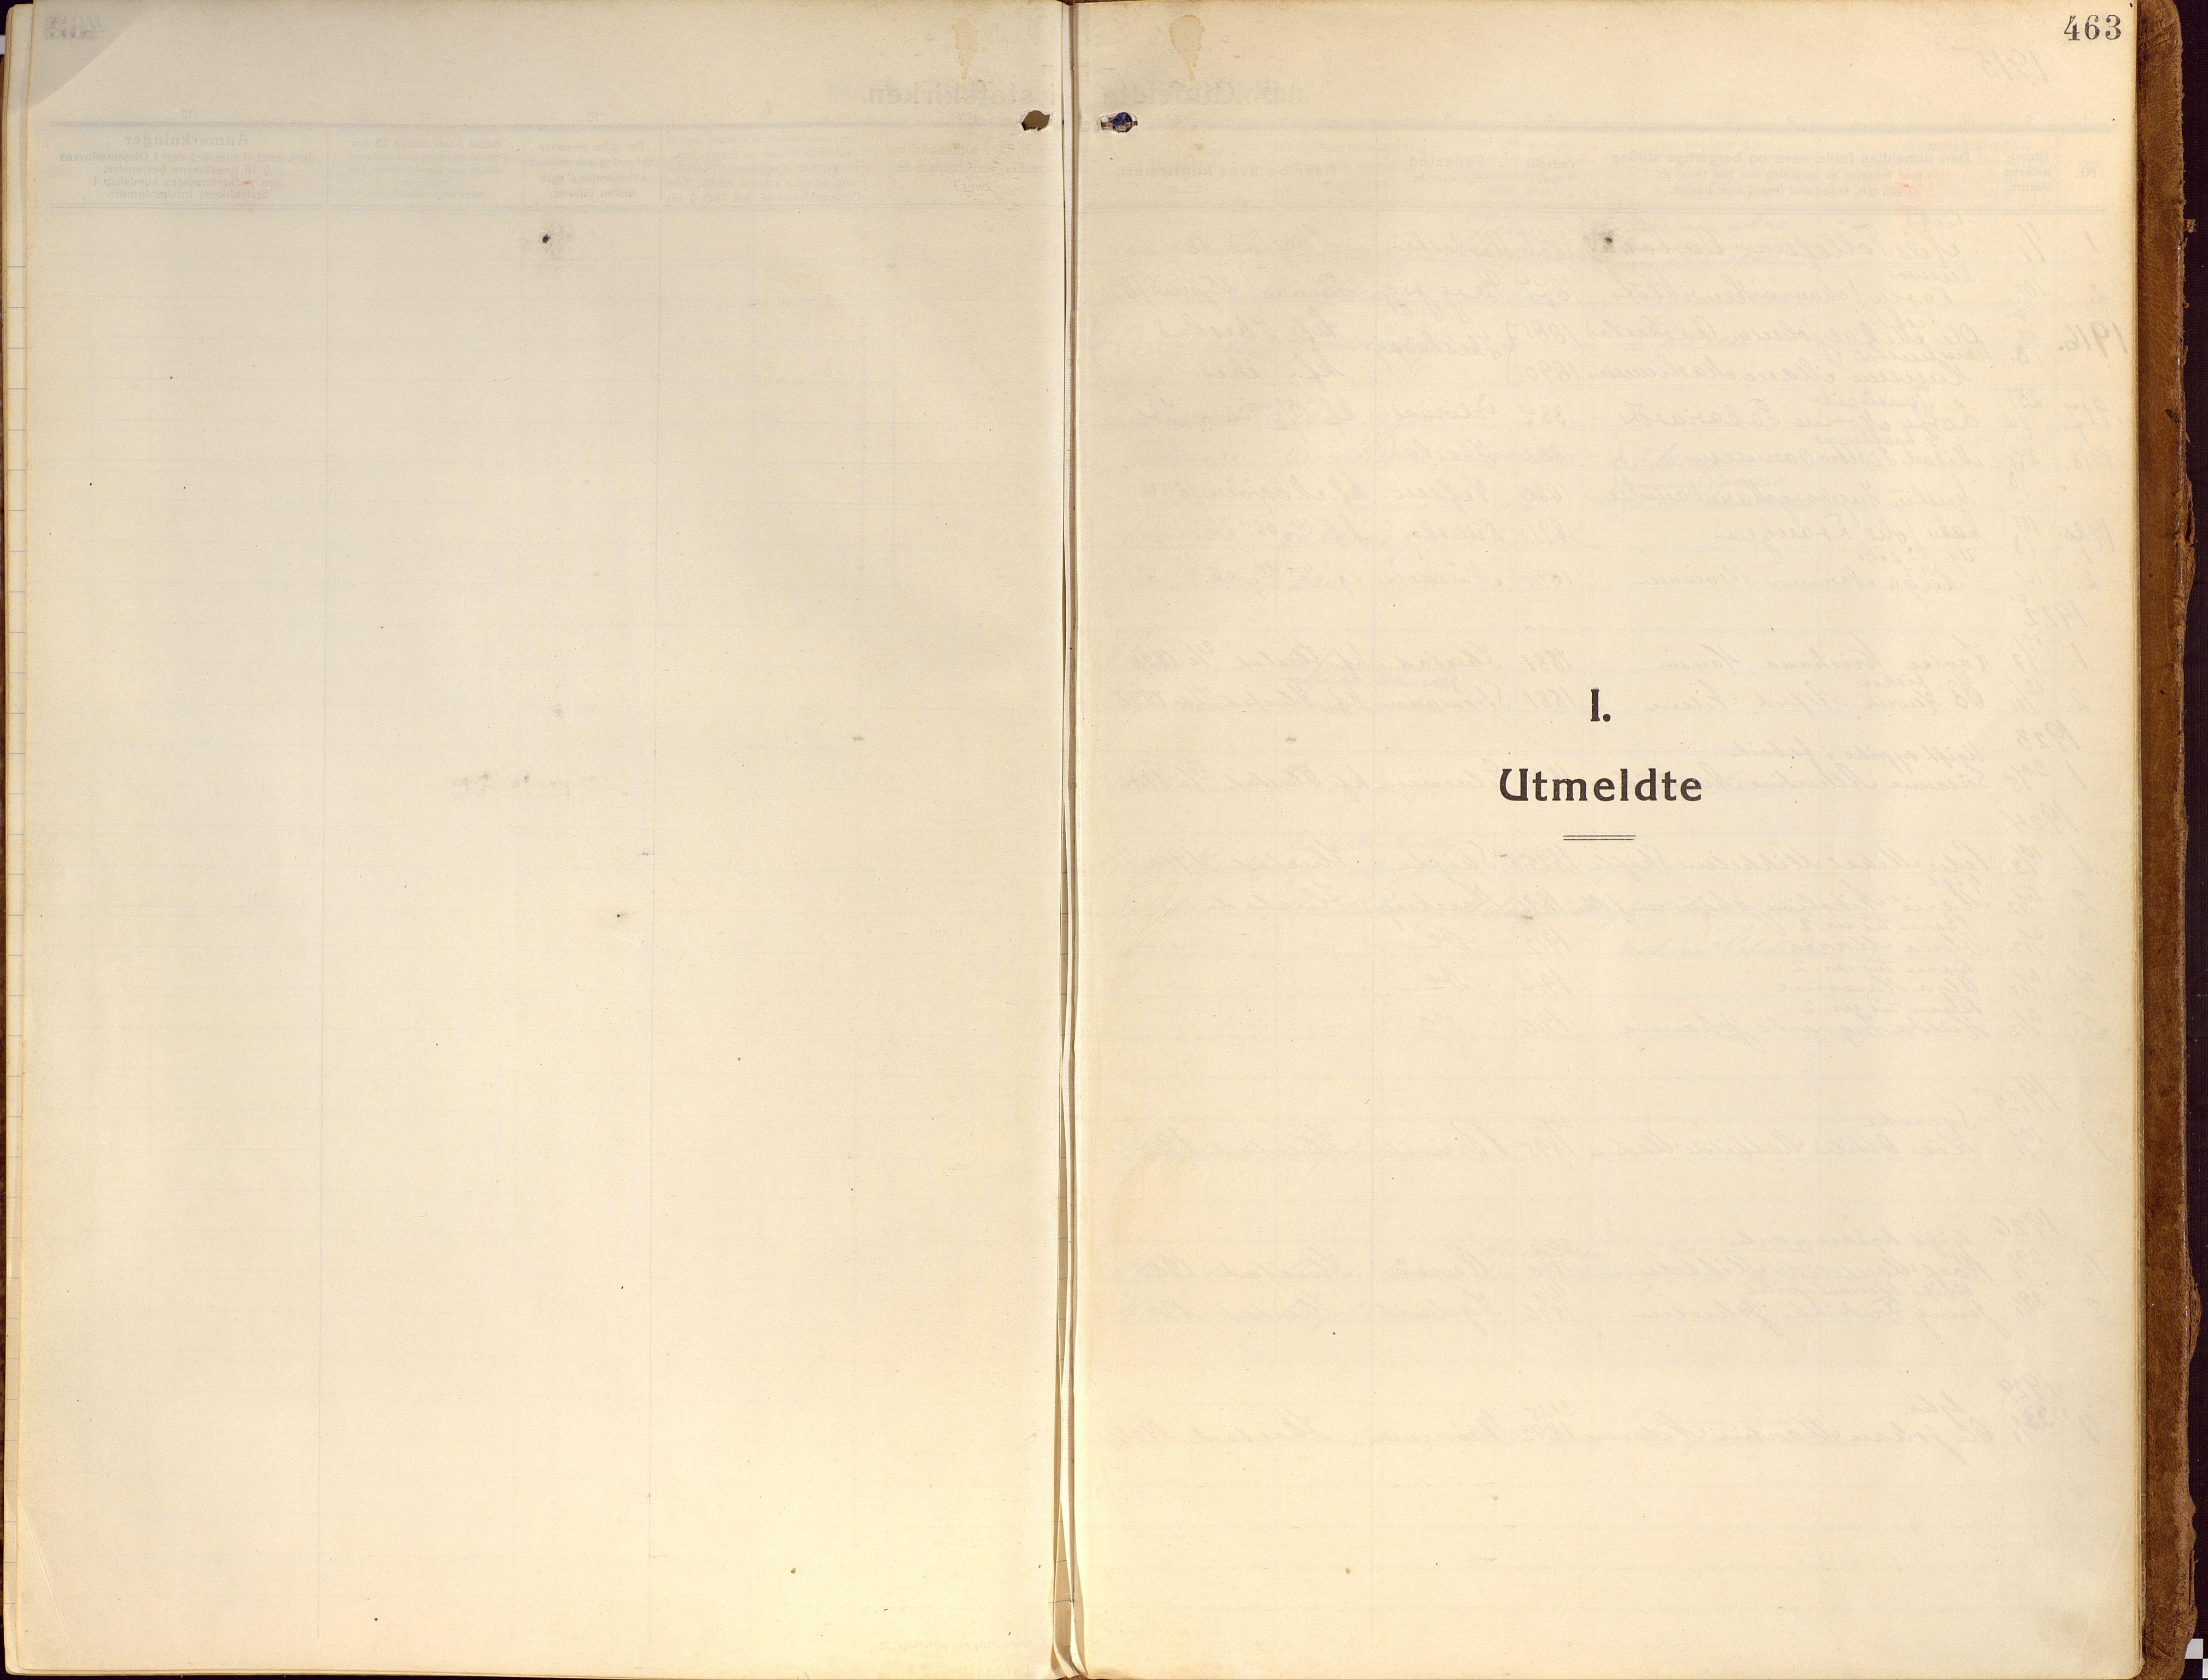 SATØ, Ibestad sokneprestembete, Ministerialbok nr. 18, 1915-1929, s. 463